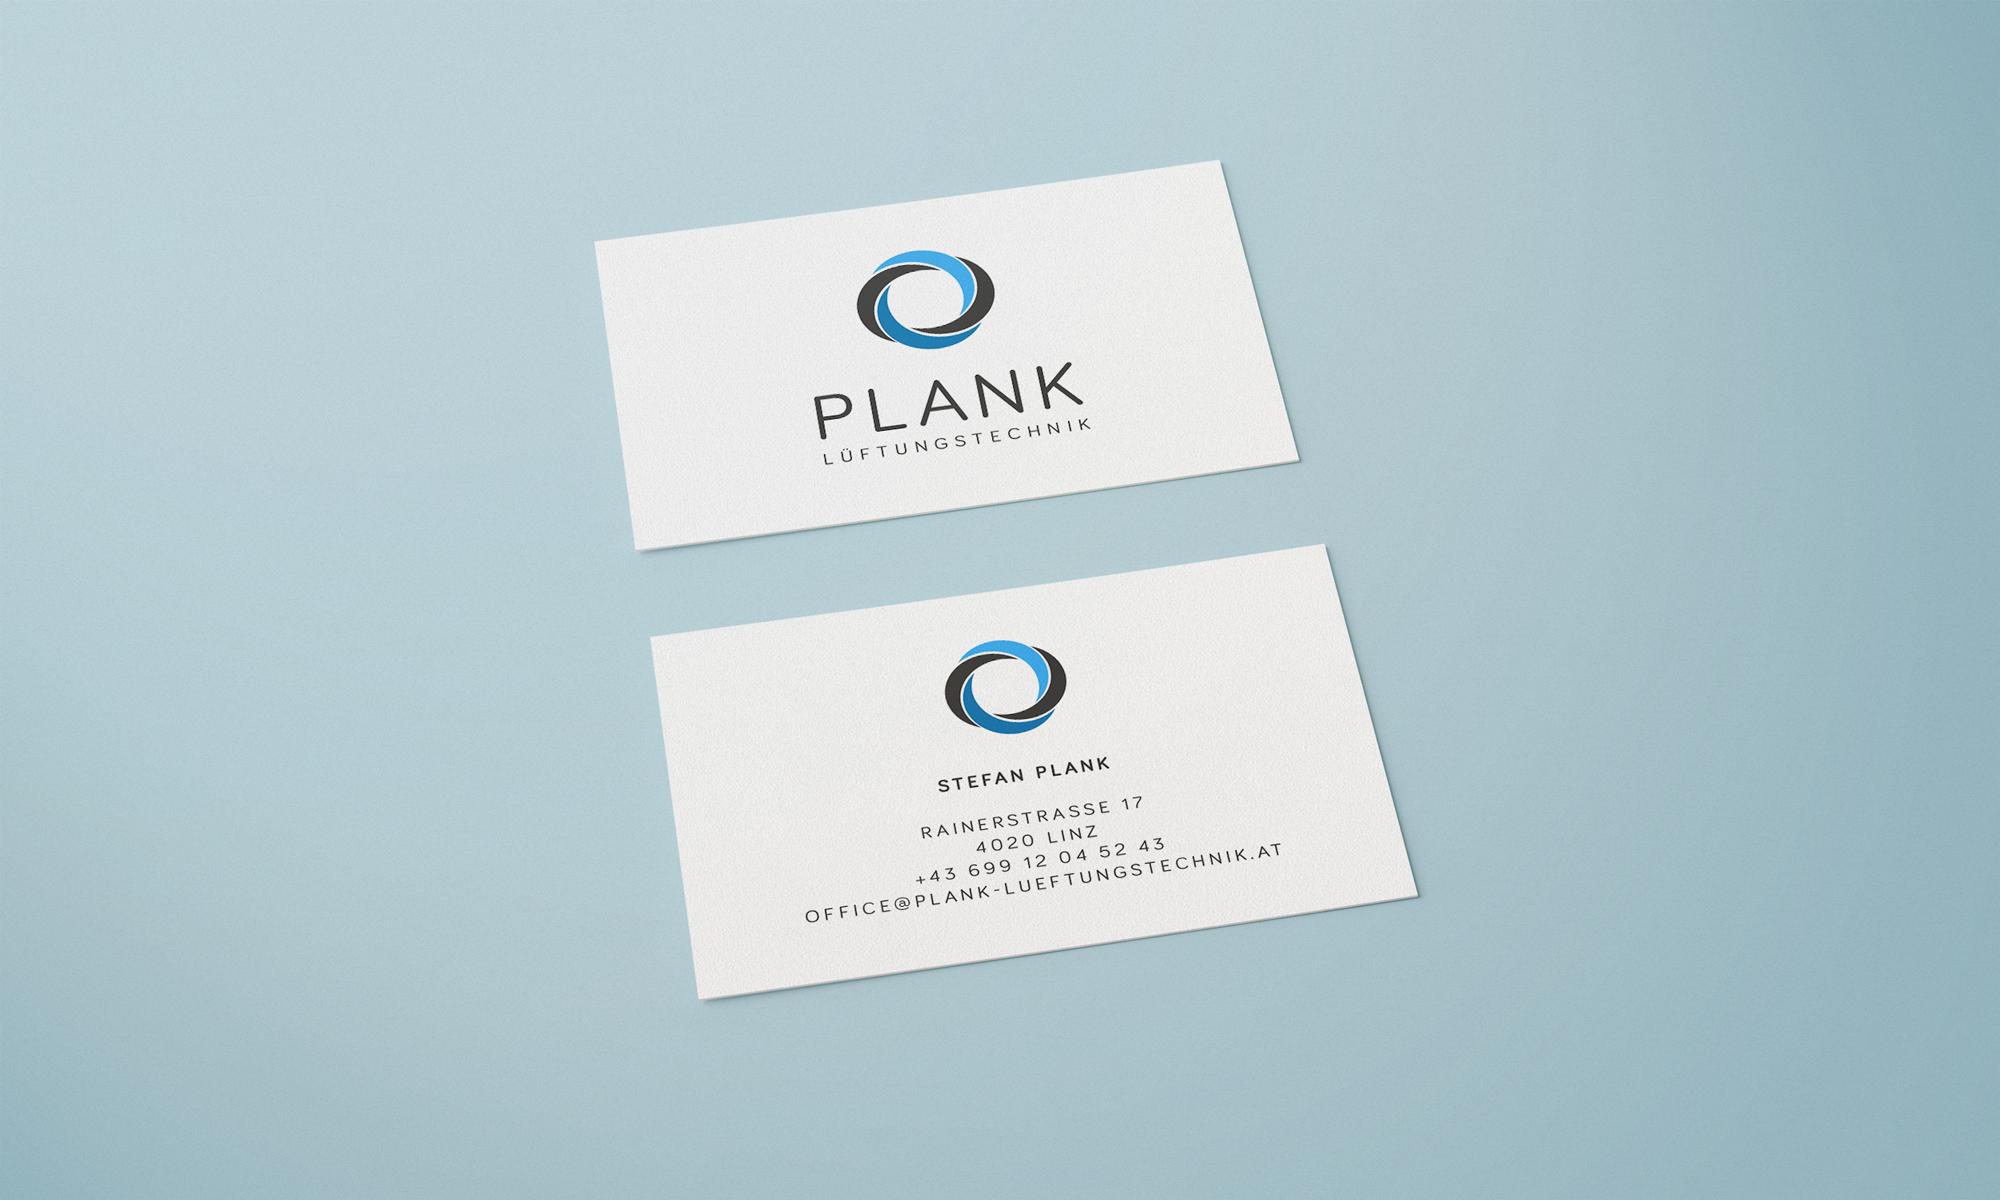 Plank_BK2